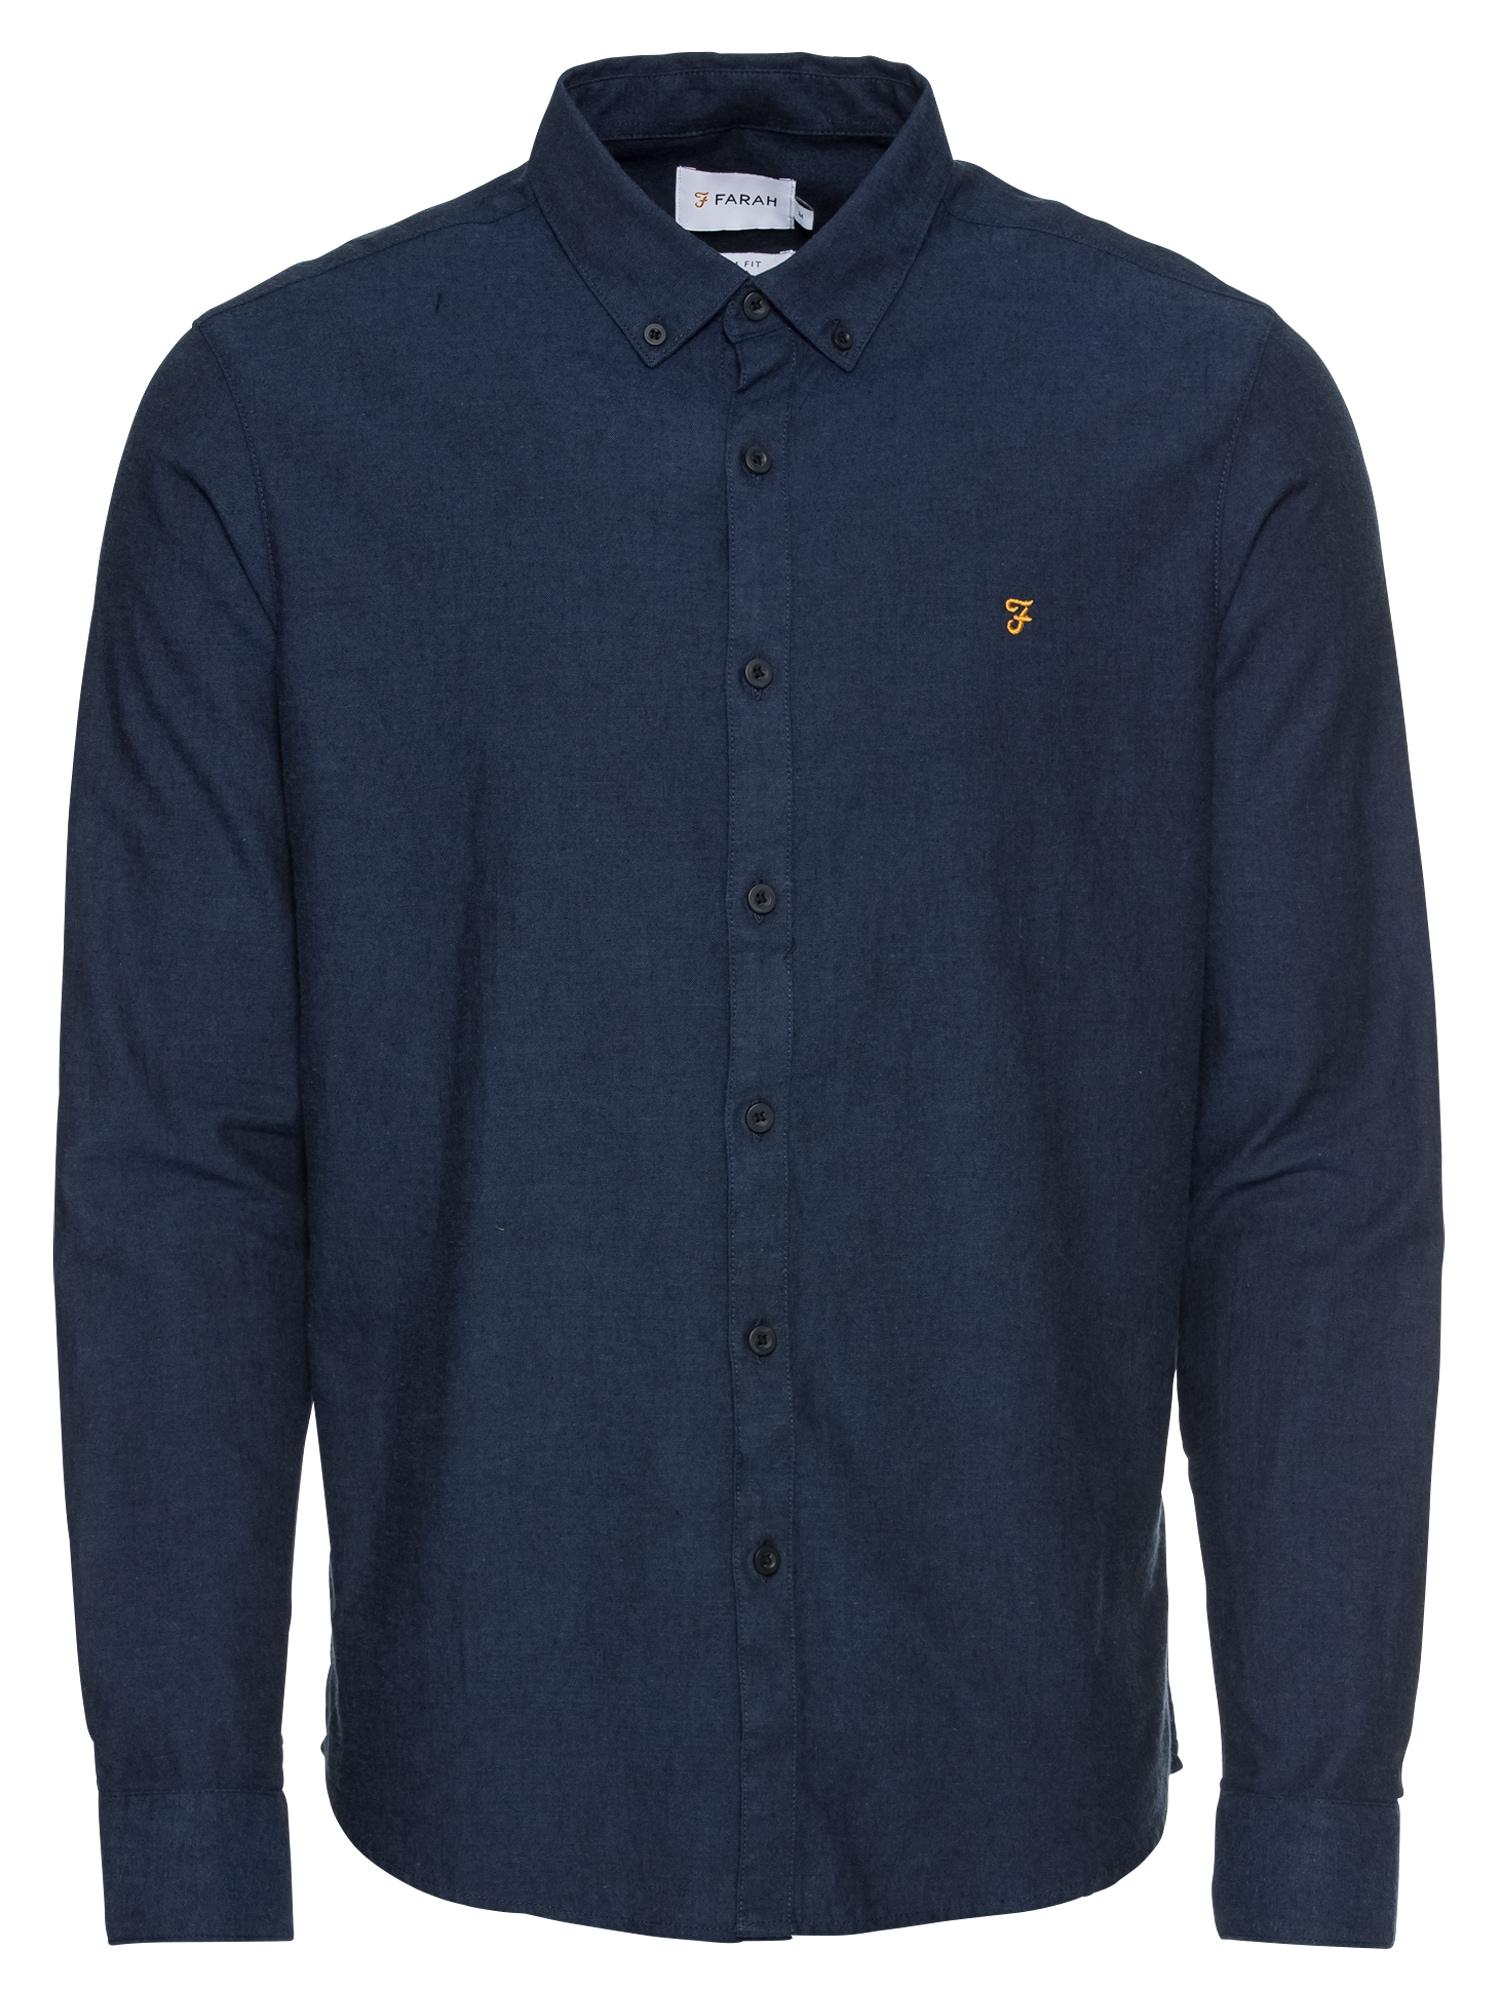 Košile STEEN LS 100% COTTON 140 GSM modrá FARAH